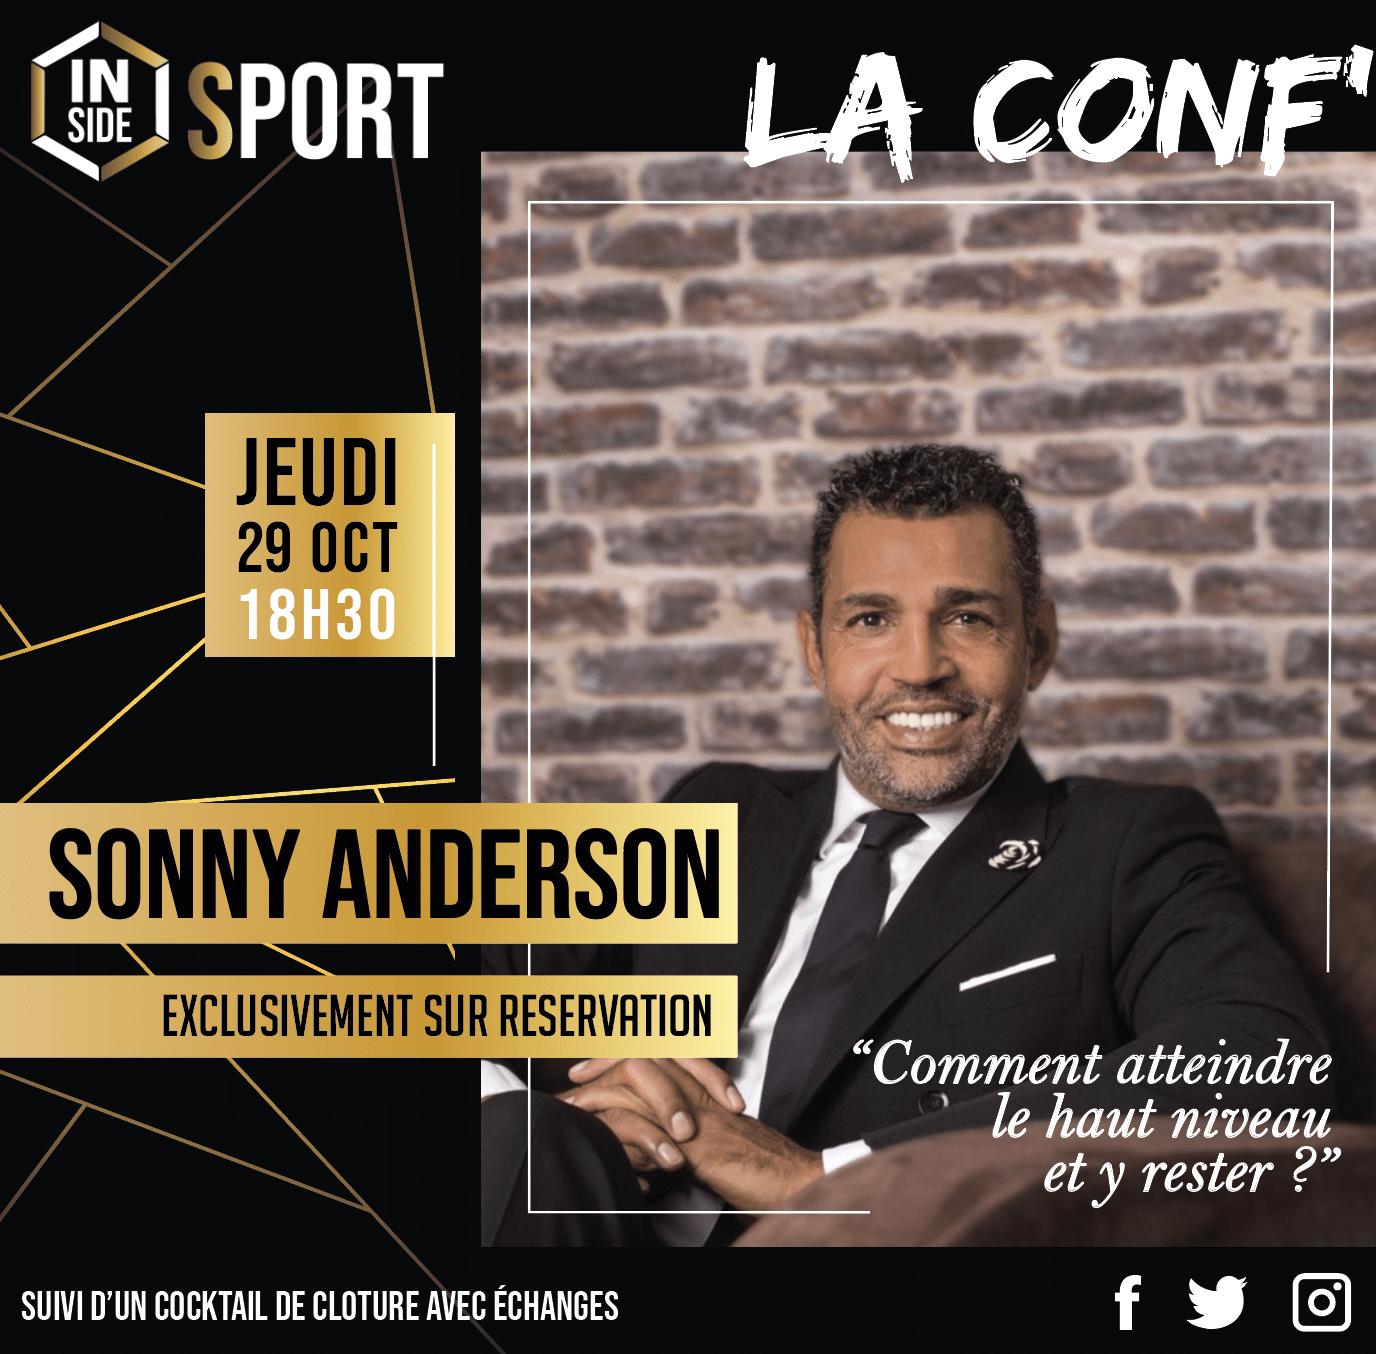 premiere-conference-inside-sport-par-sonny-anderson